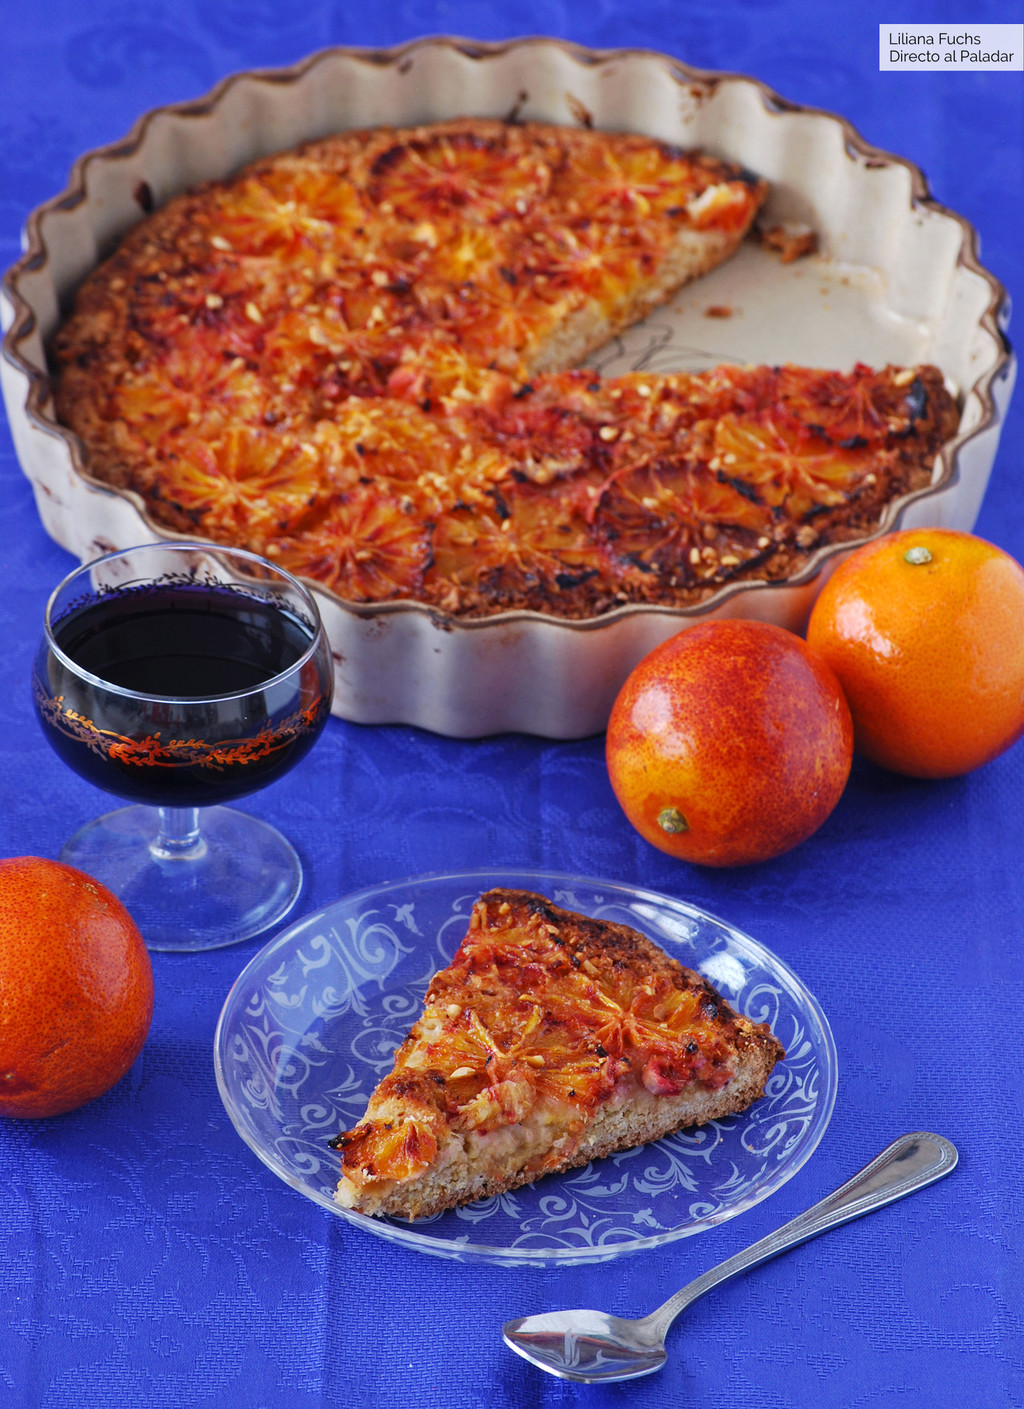 Receta de tarta fina de naranja sanguina y avellana, un postre para amantes de los cítricos